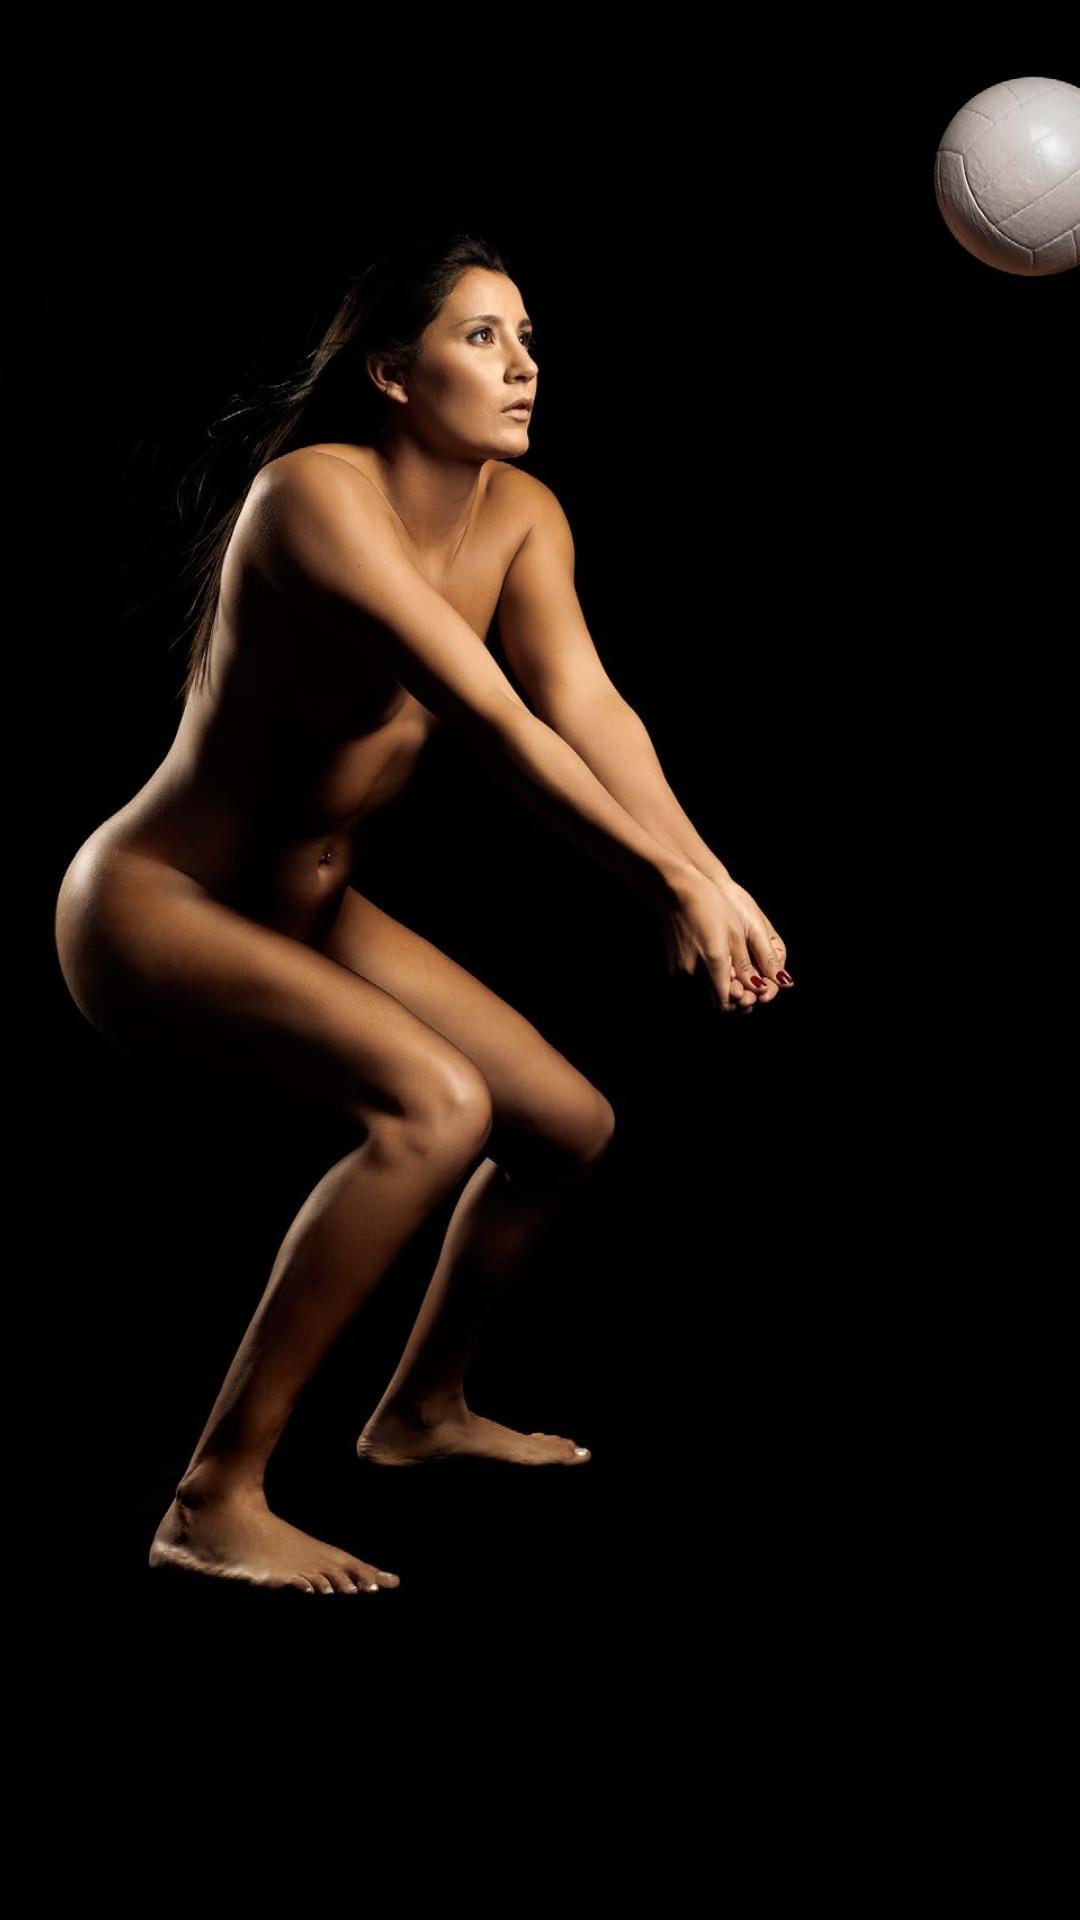 Belen Gimenez Desnuda el desnudo de gustavo fern�ndez, yamila nizetich y otros